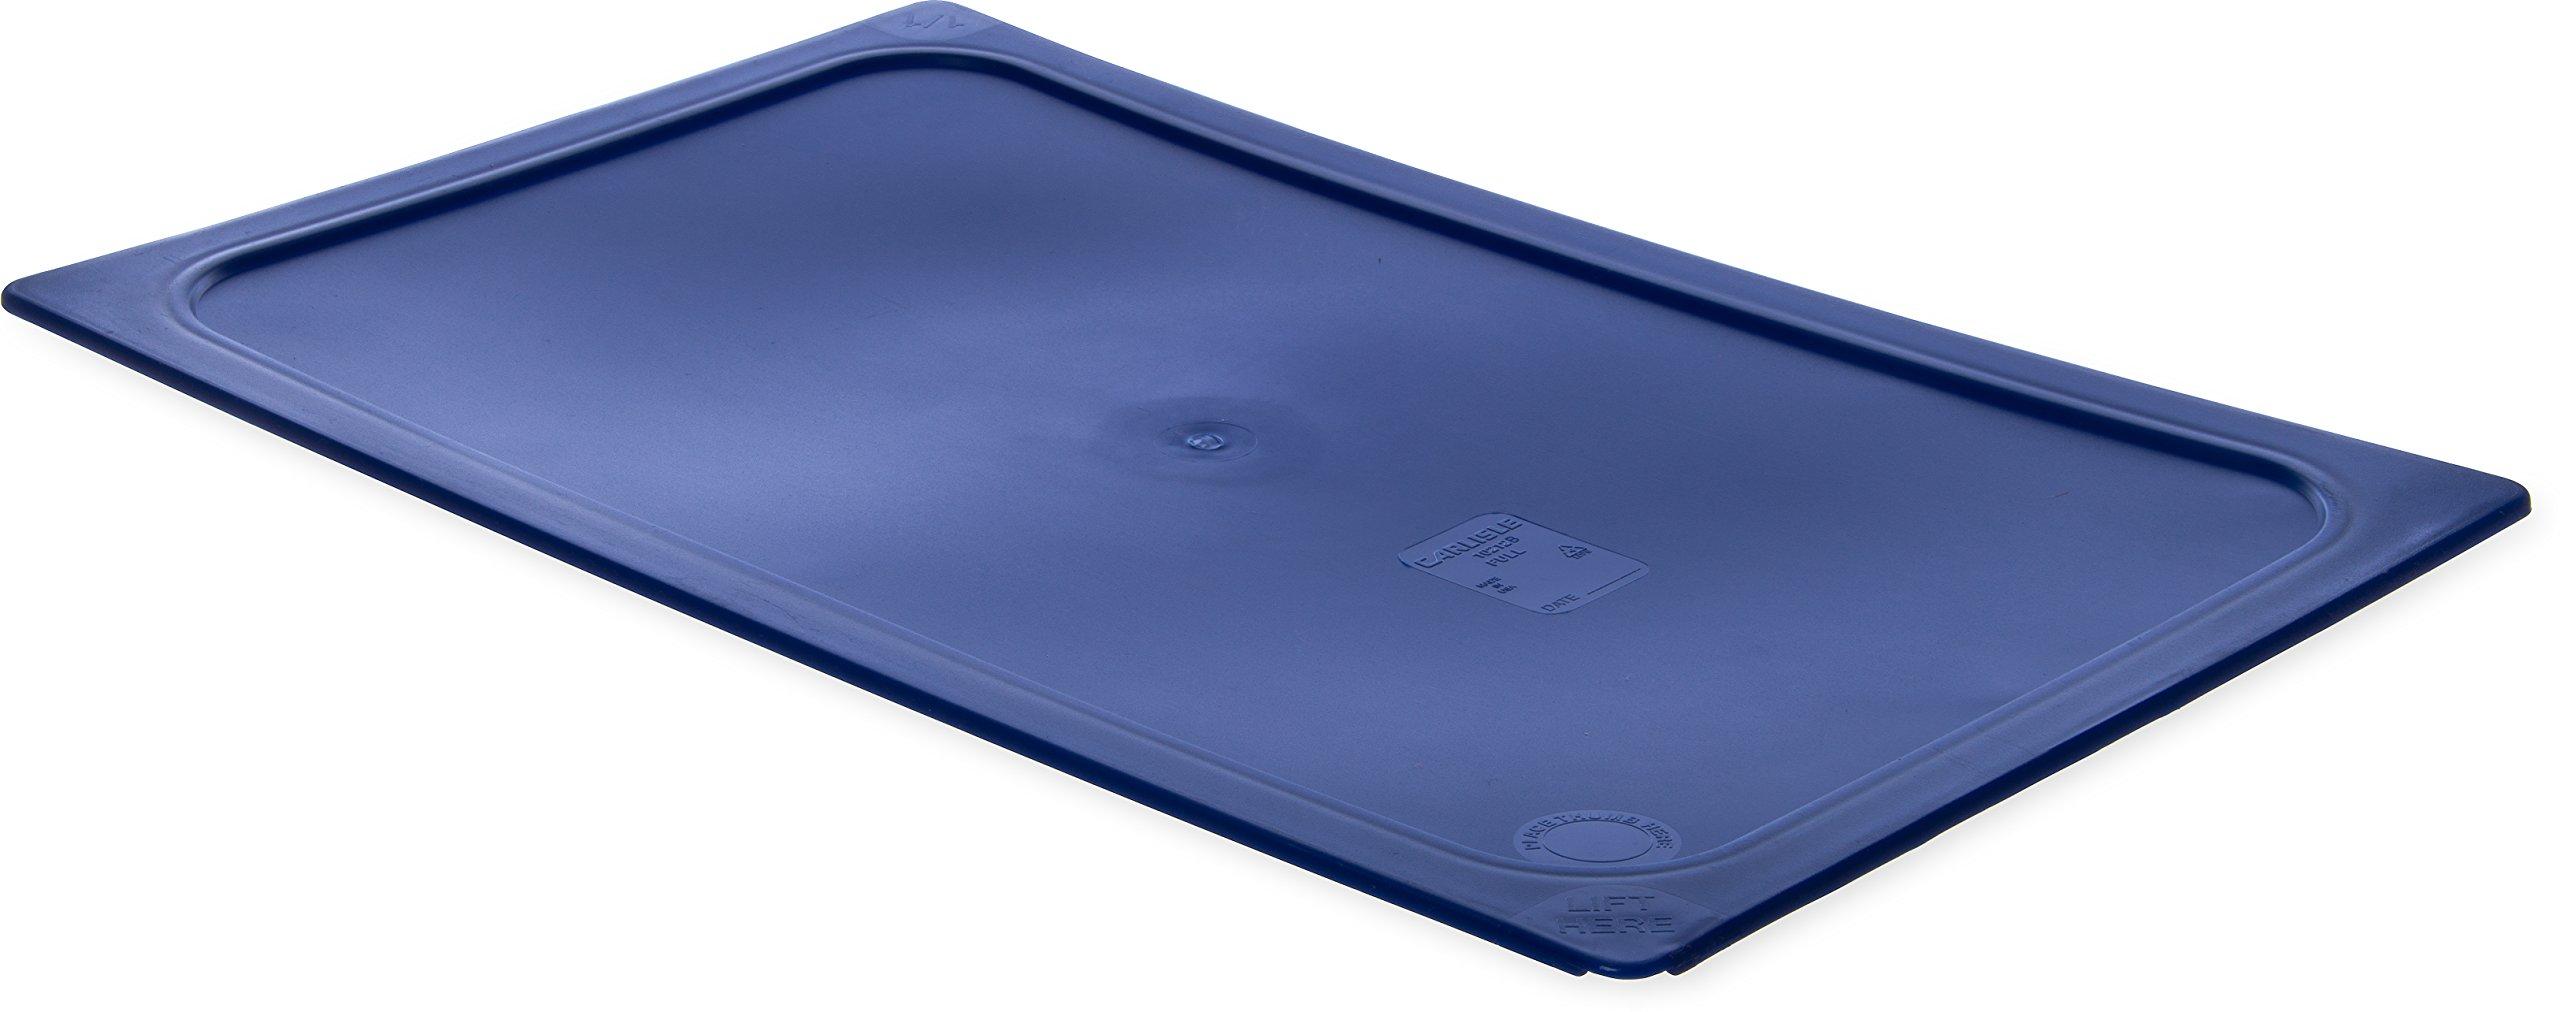 Carlisle 10212B60 Smart Lids Full Size Polyethylene Lid, Dark Blue